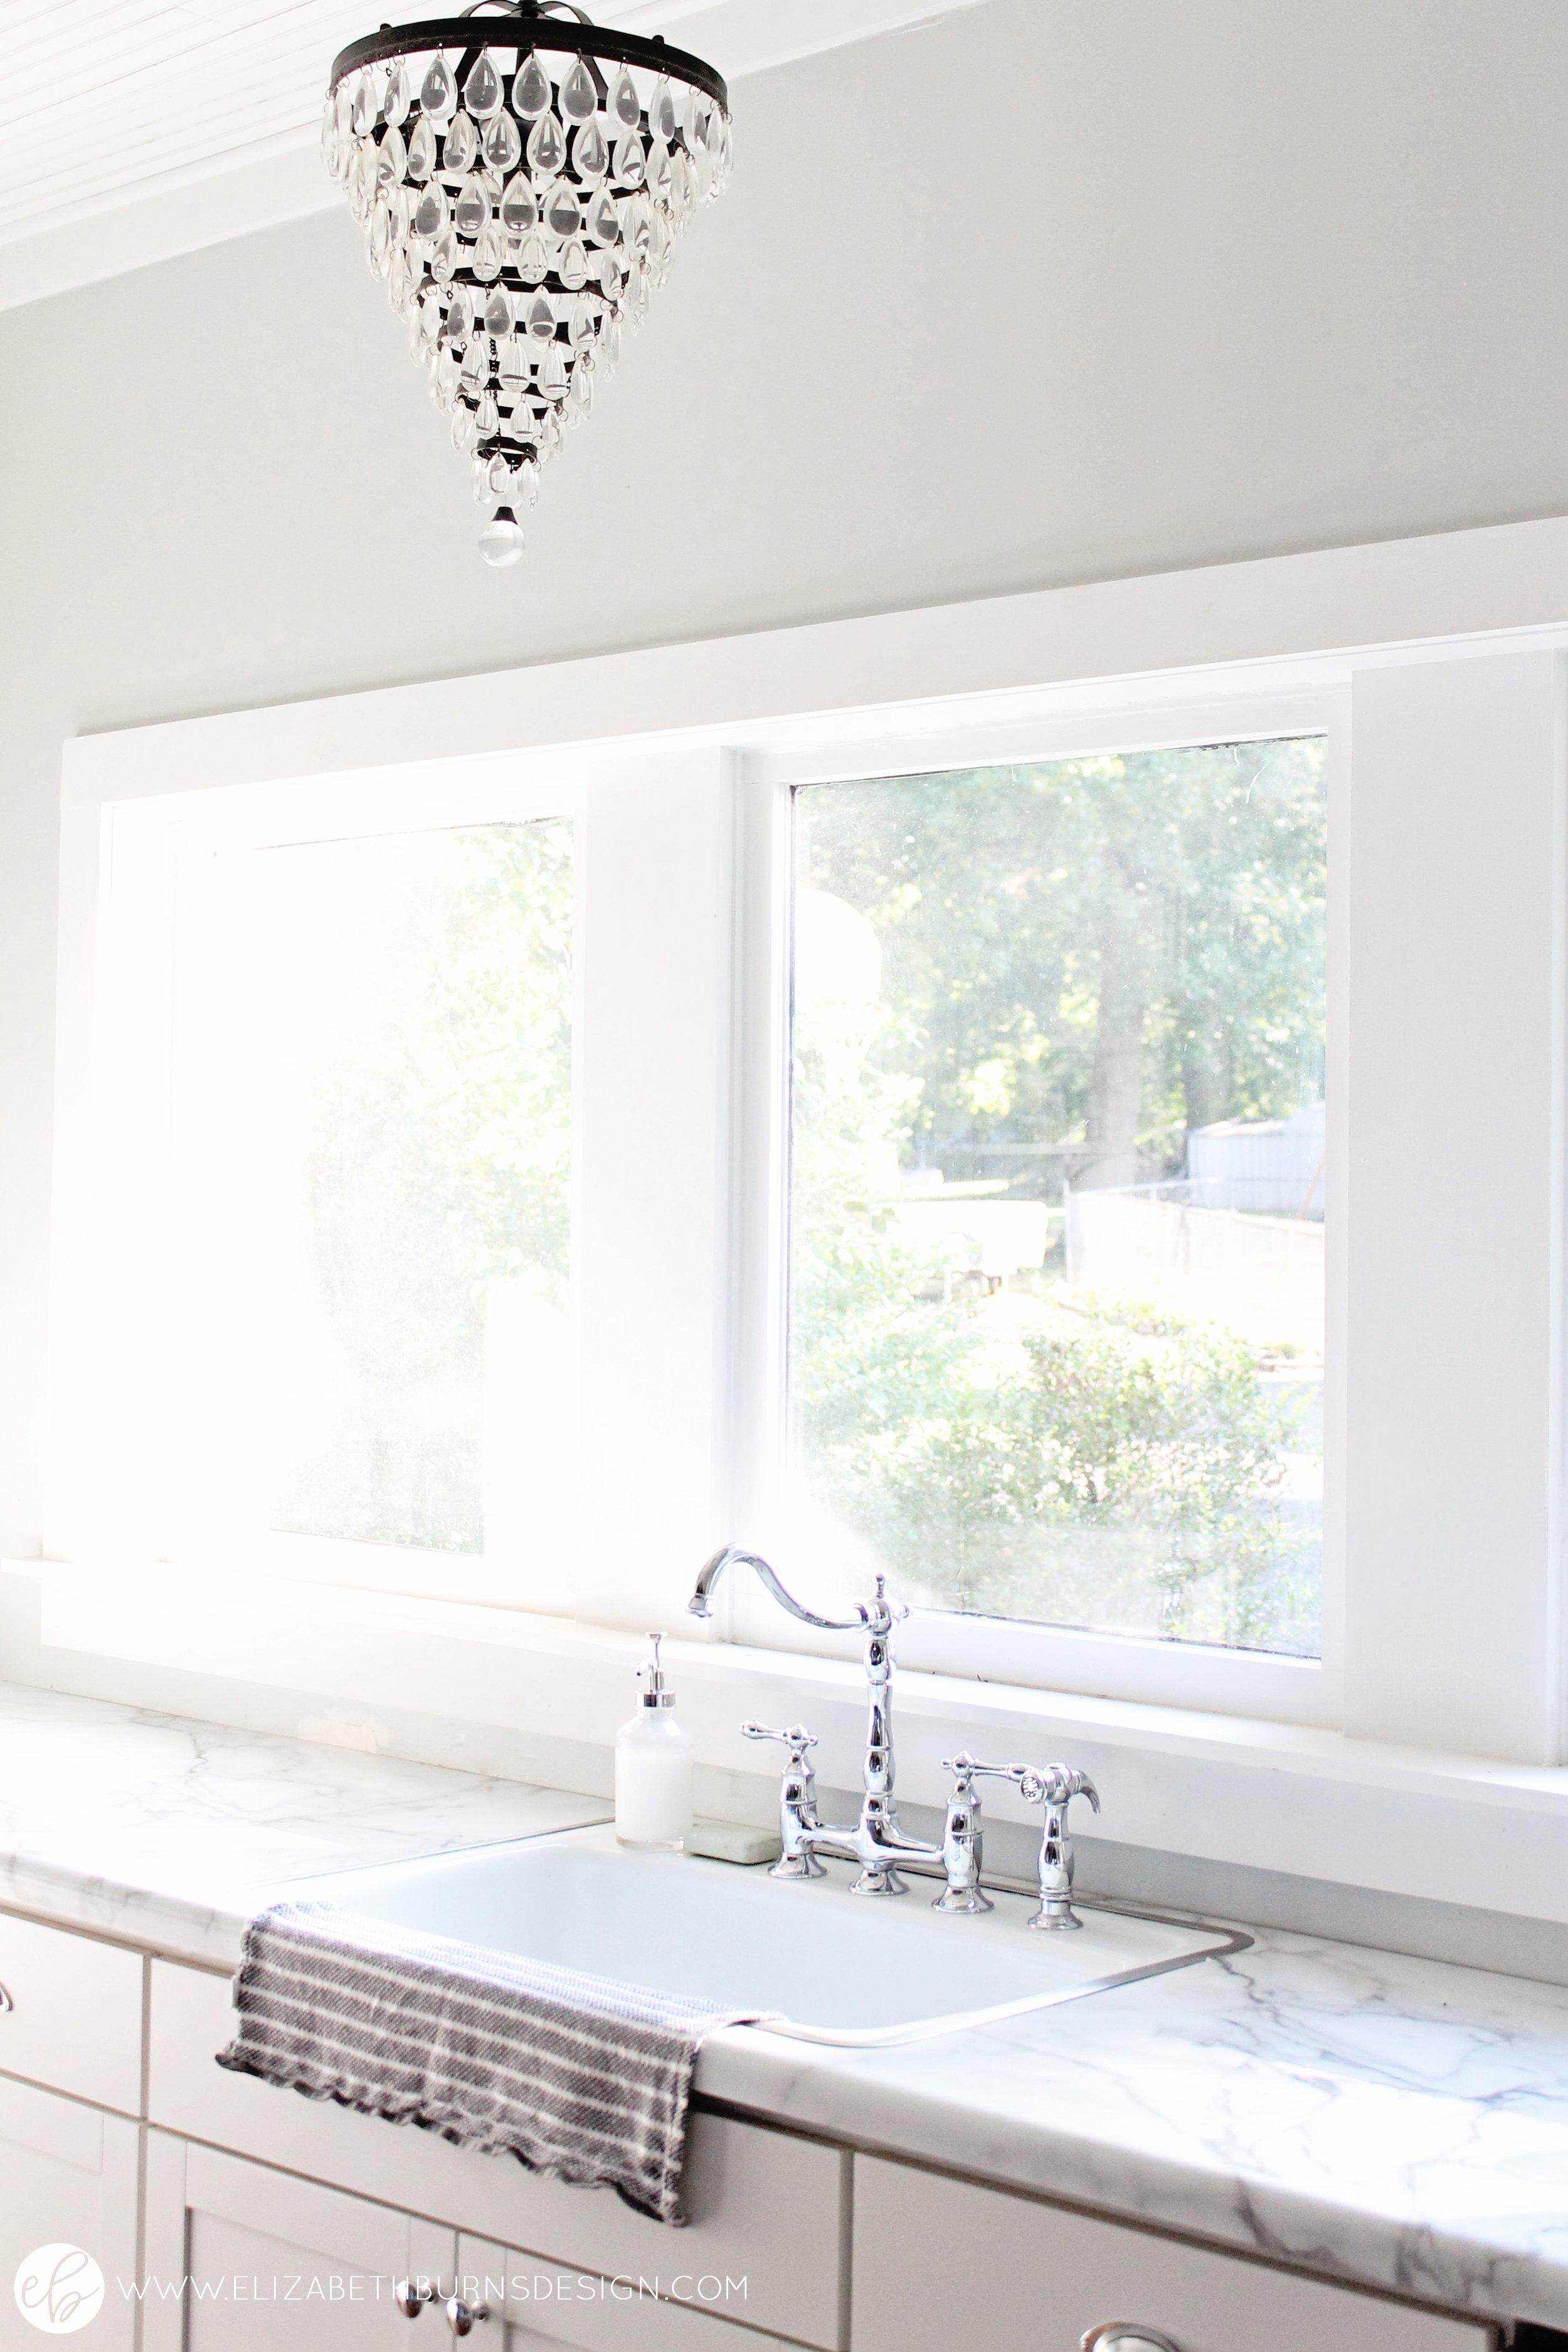 Elizabeth Burns Design   Free Kitchen Sink, Inexpensive Kitchen Renovation, Budget Kitchen Design, Farmhouse Style, Fixer Upper, Sherwin Williams Silver Strand